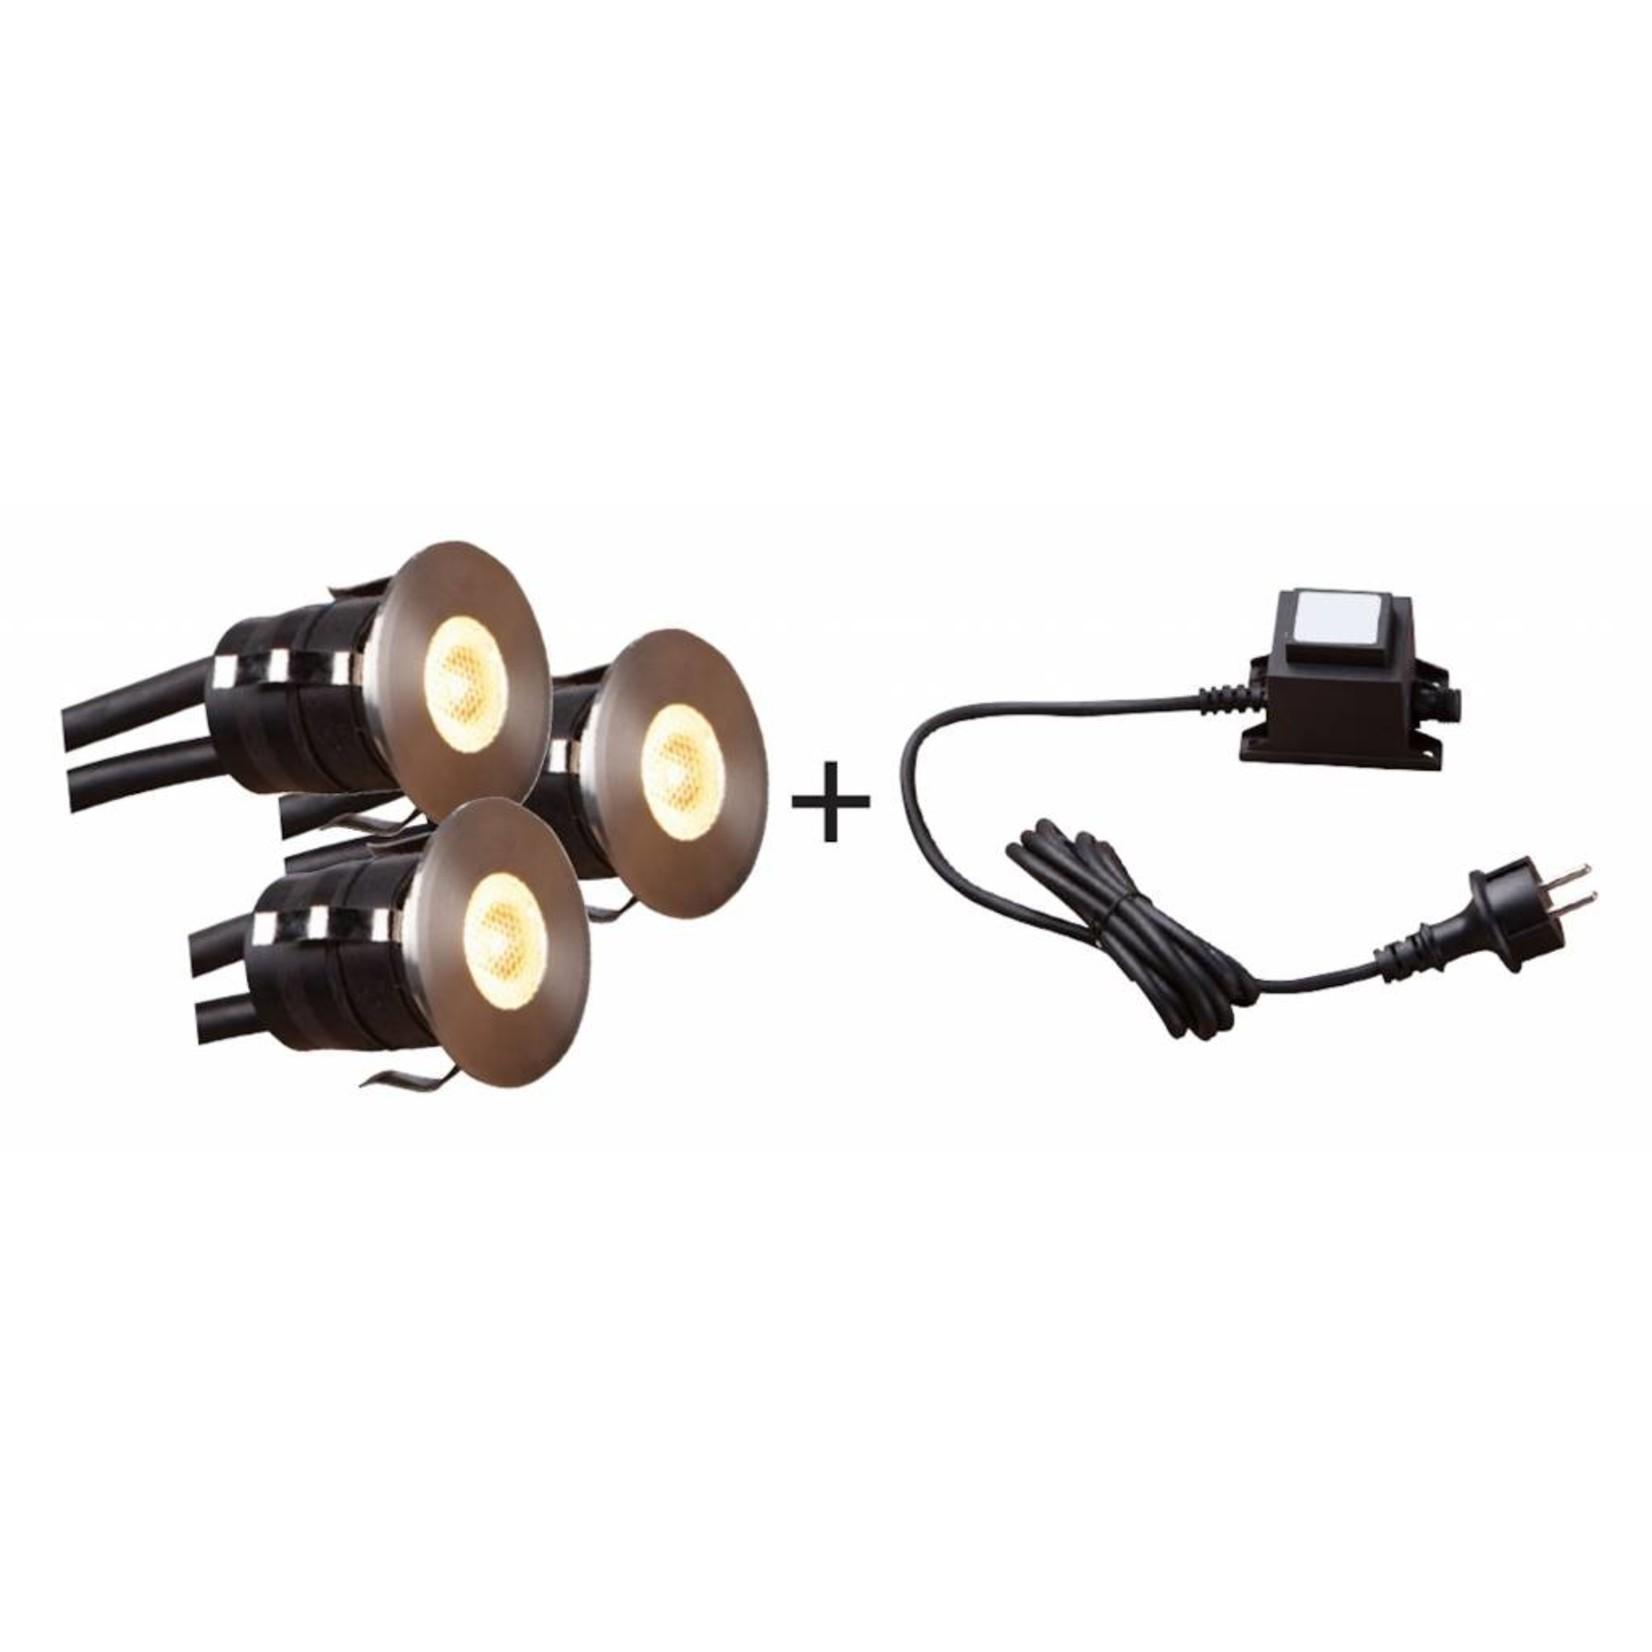 Smart Light starterset vlonderverlichting